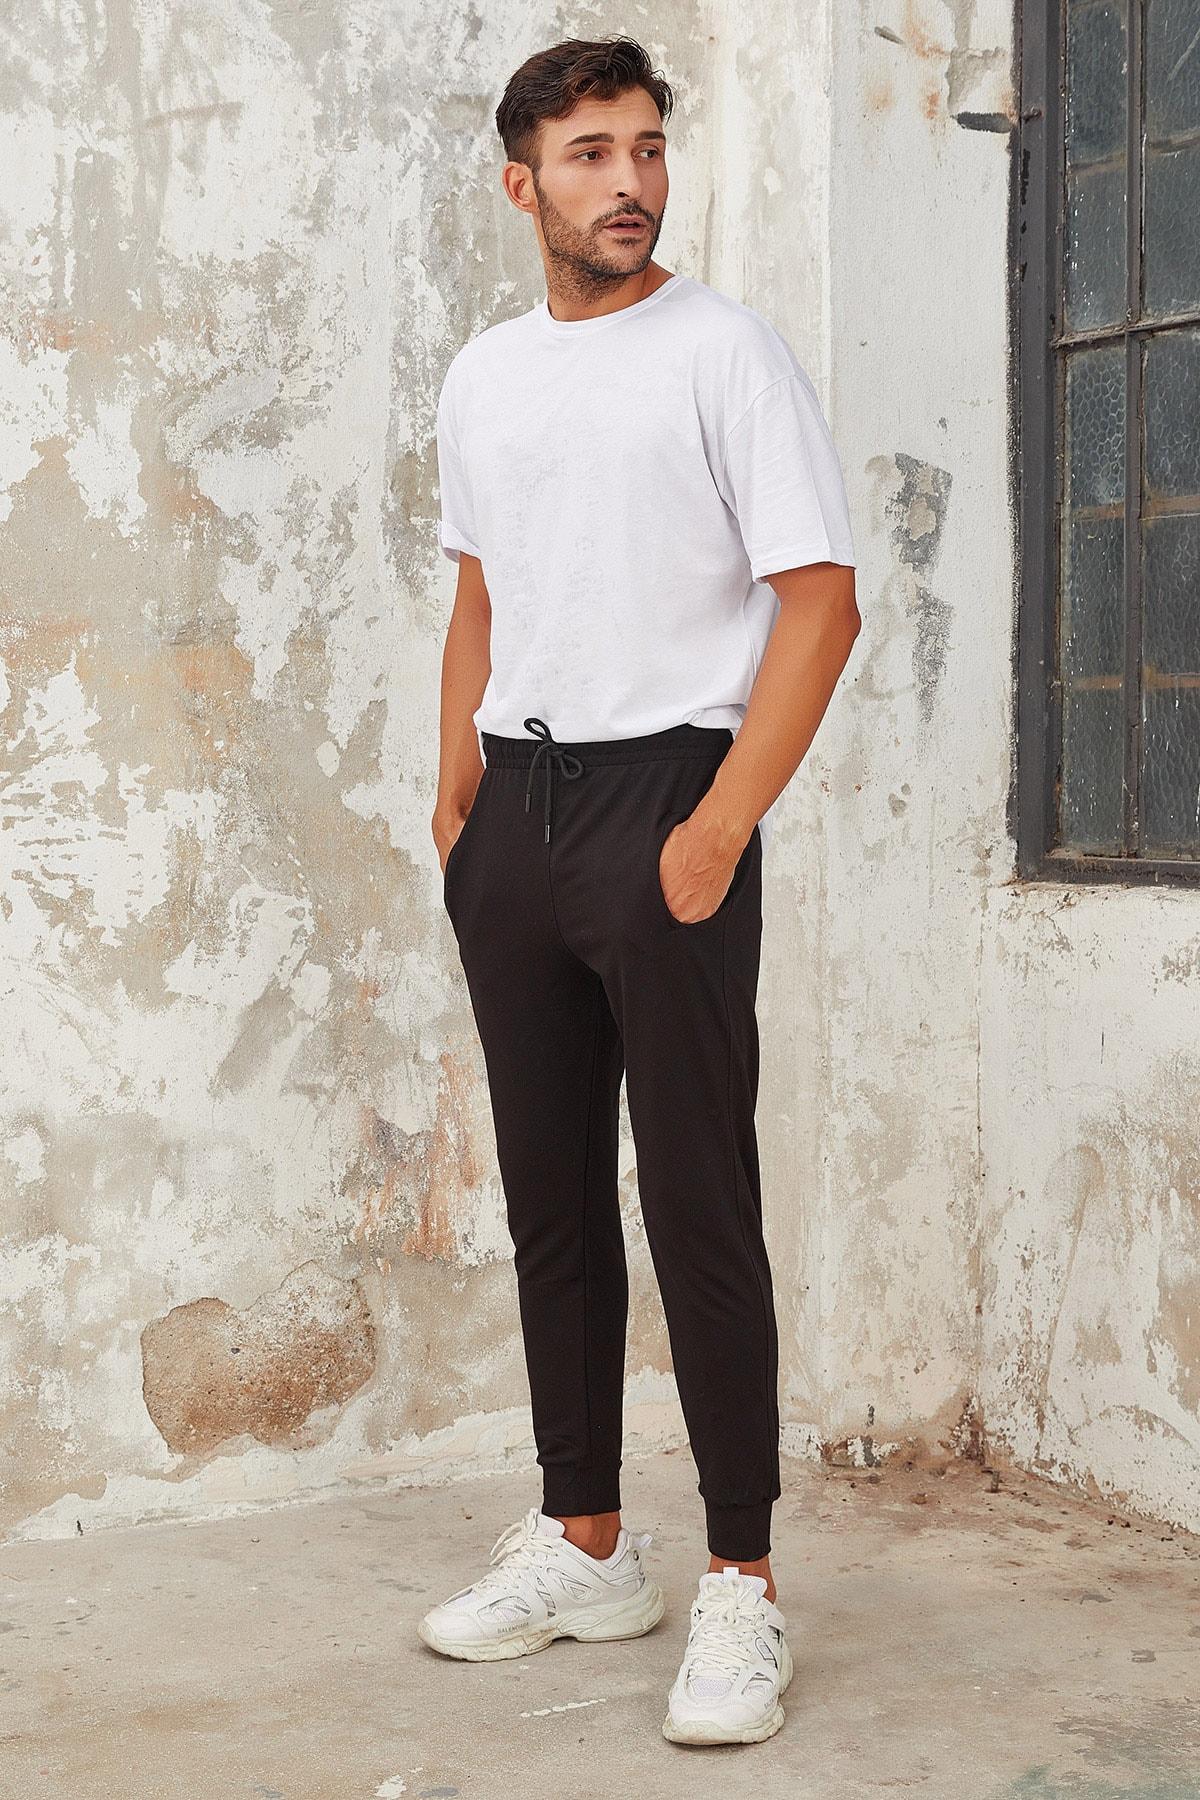 OnlyCool Erkek Siyah Dar Paça Jogger Eşofman Altı 1